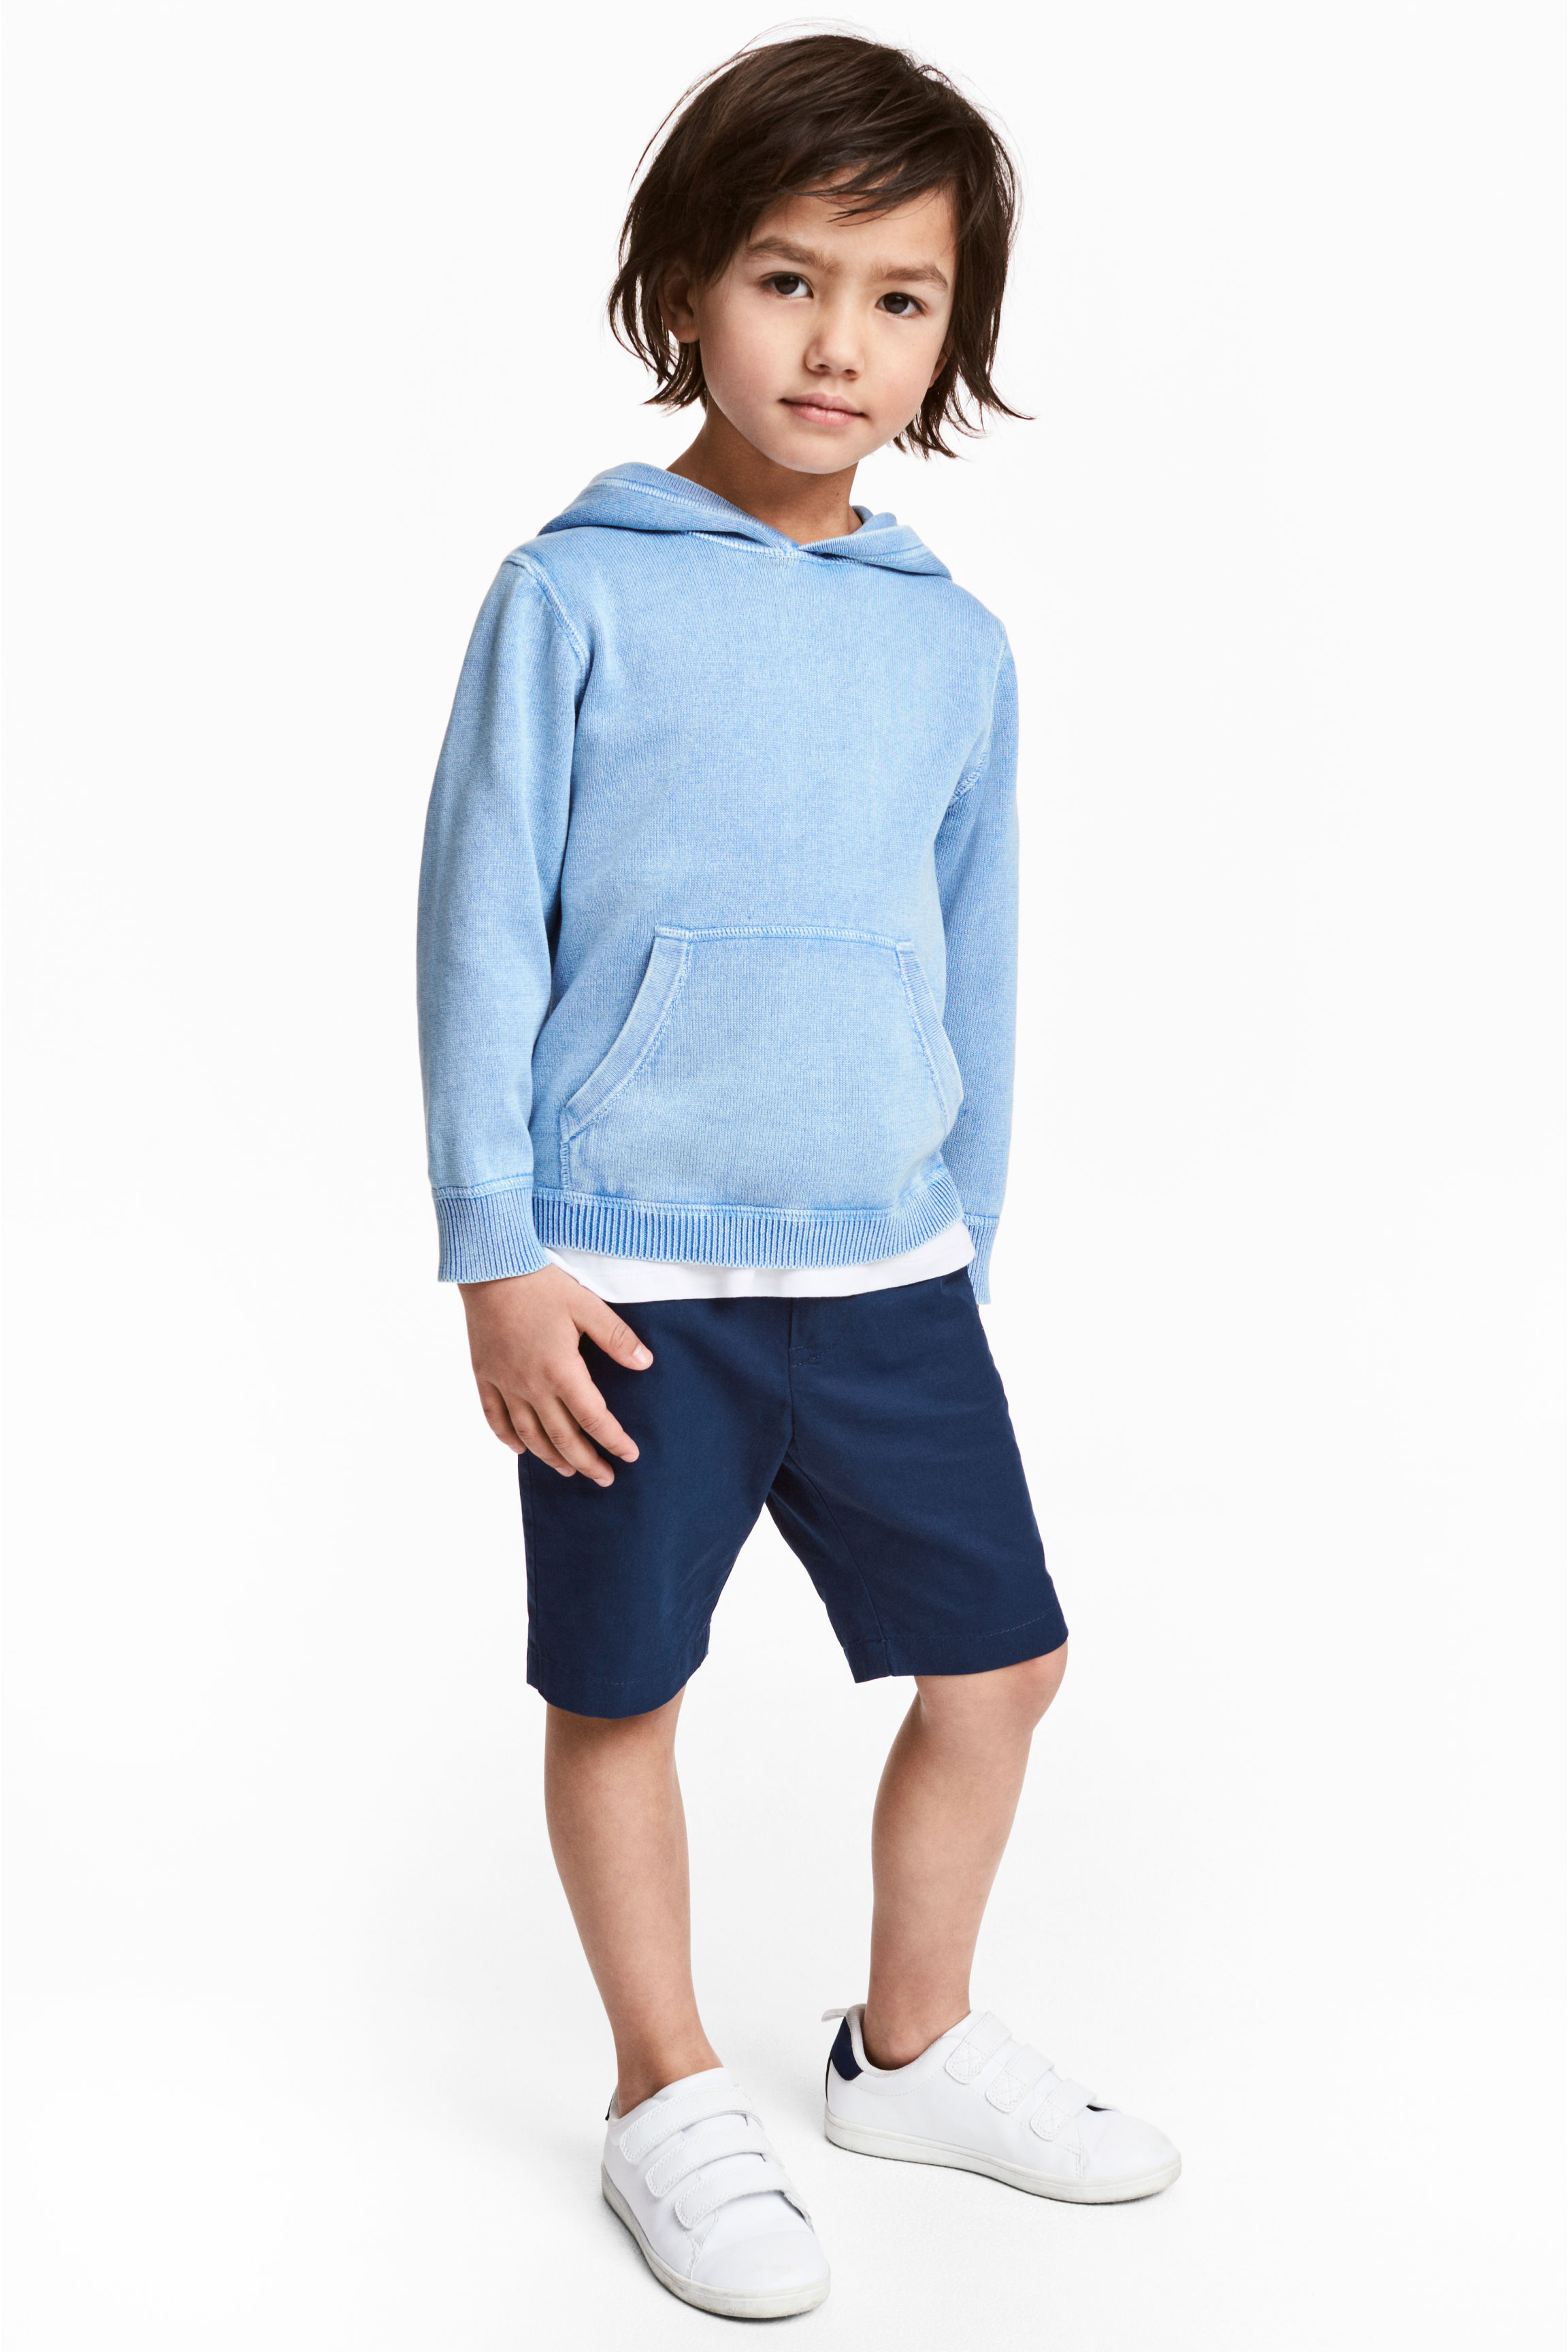 Pantaloni scurți chino - Albastru-închis - COPII | H&M RO 1